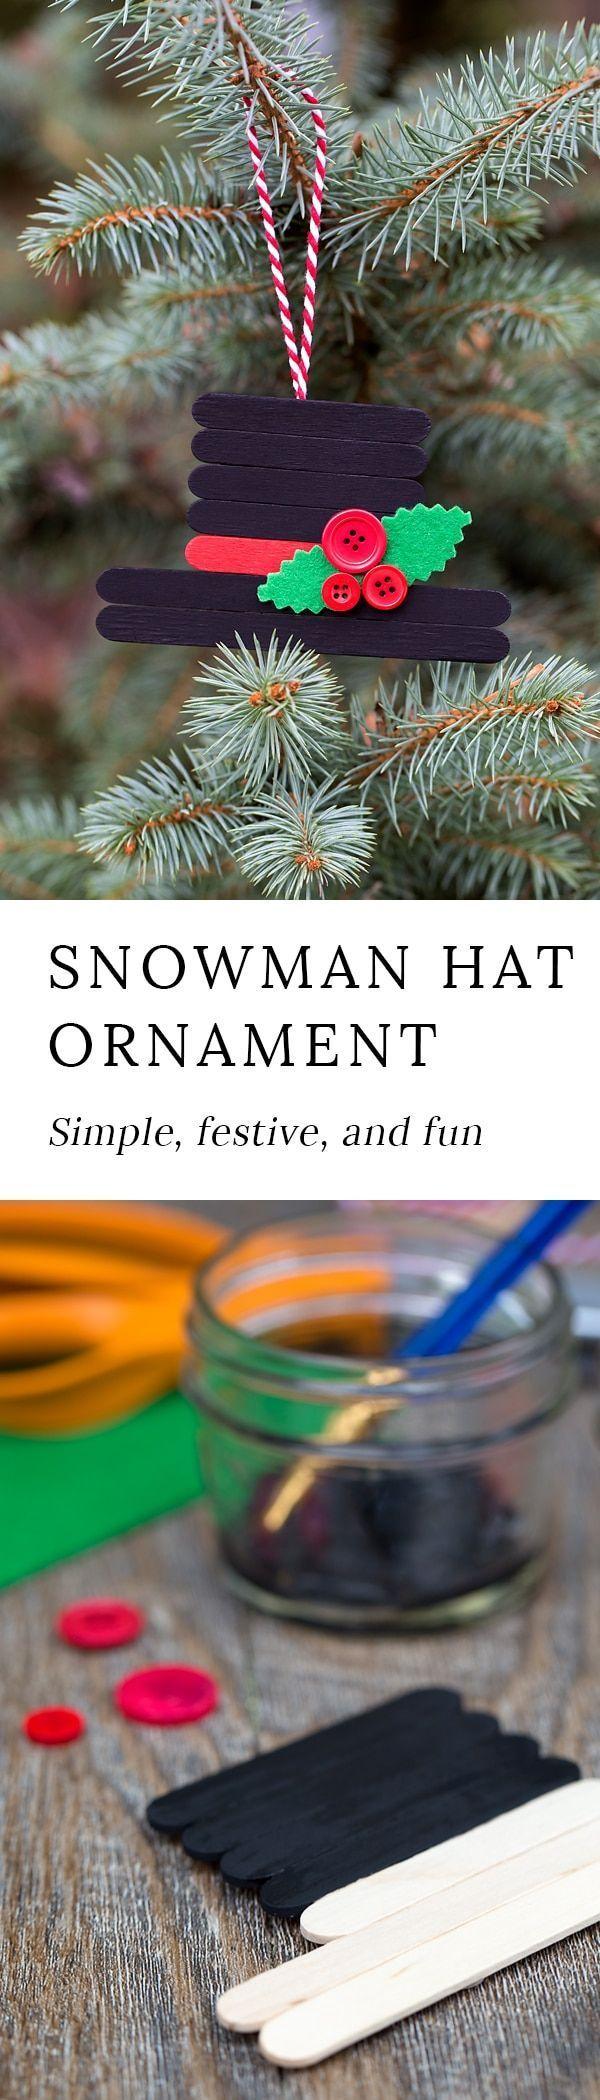 Popsicle Stick Snowman Hat Ornament Recipe Christmas